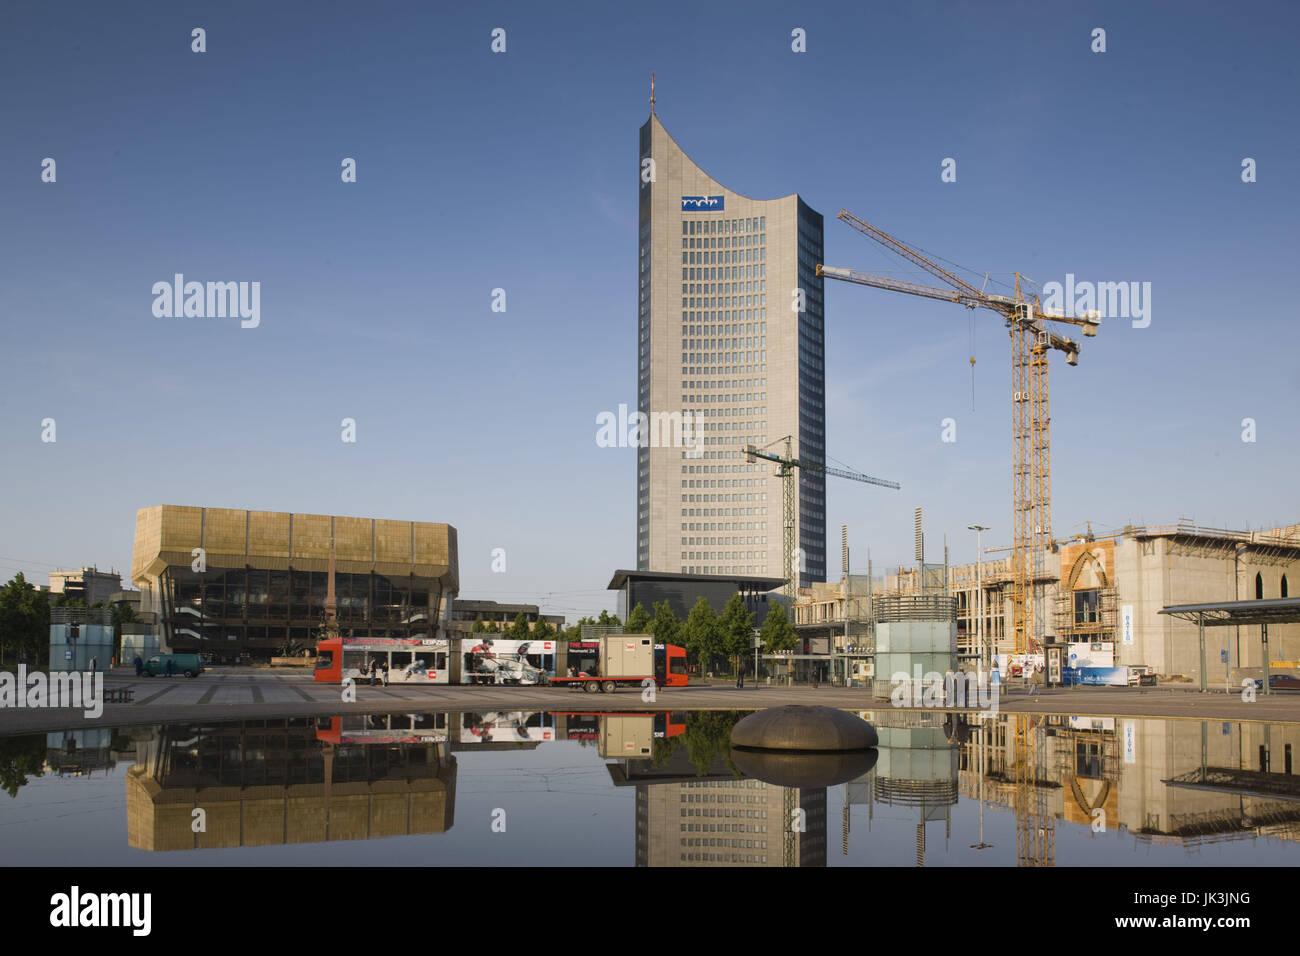 Germany, Sachsen, Leipzig, MDR Hochhaus tower, Augustusplatz, - Stock Image